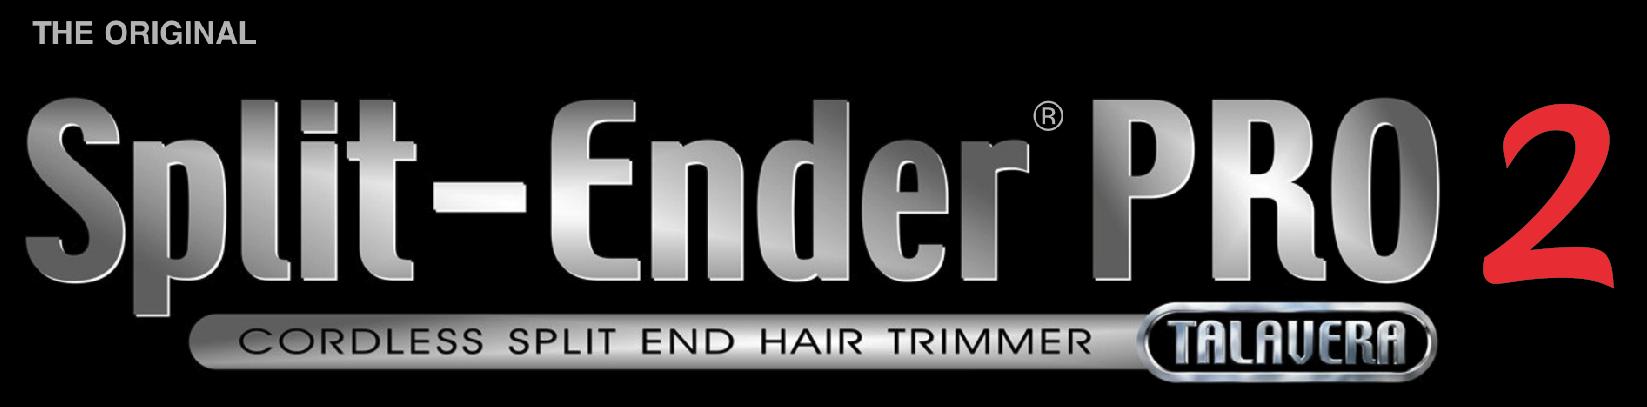 Talavera Split-Ender Pro